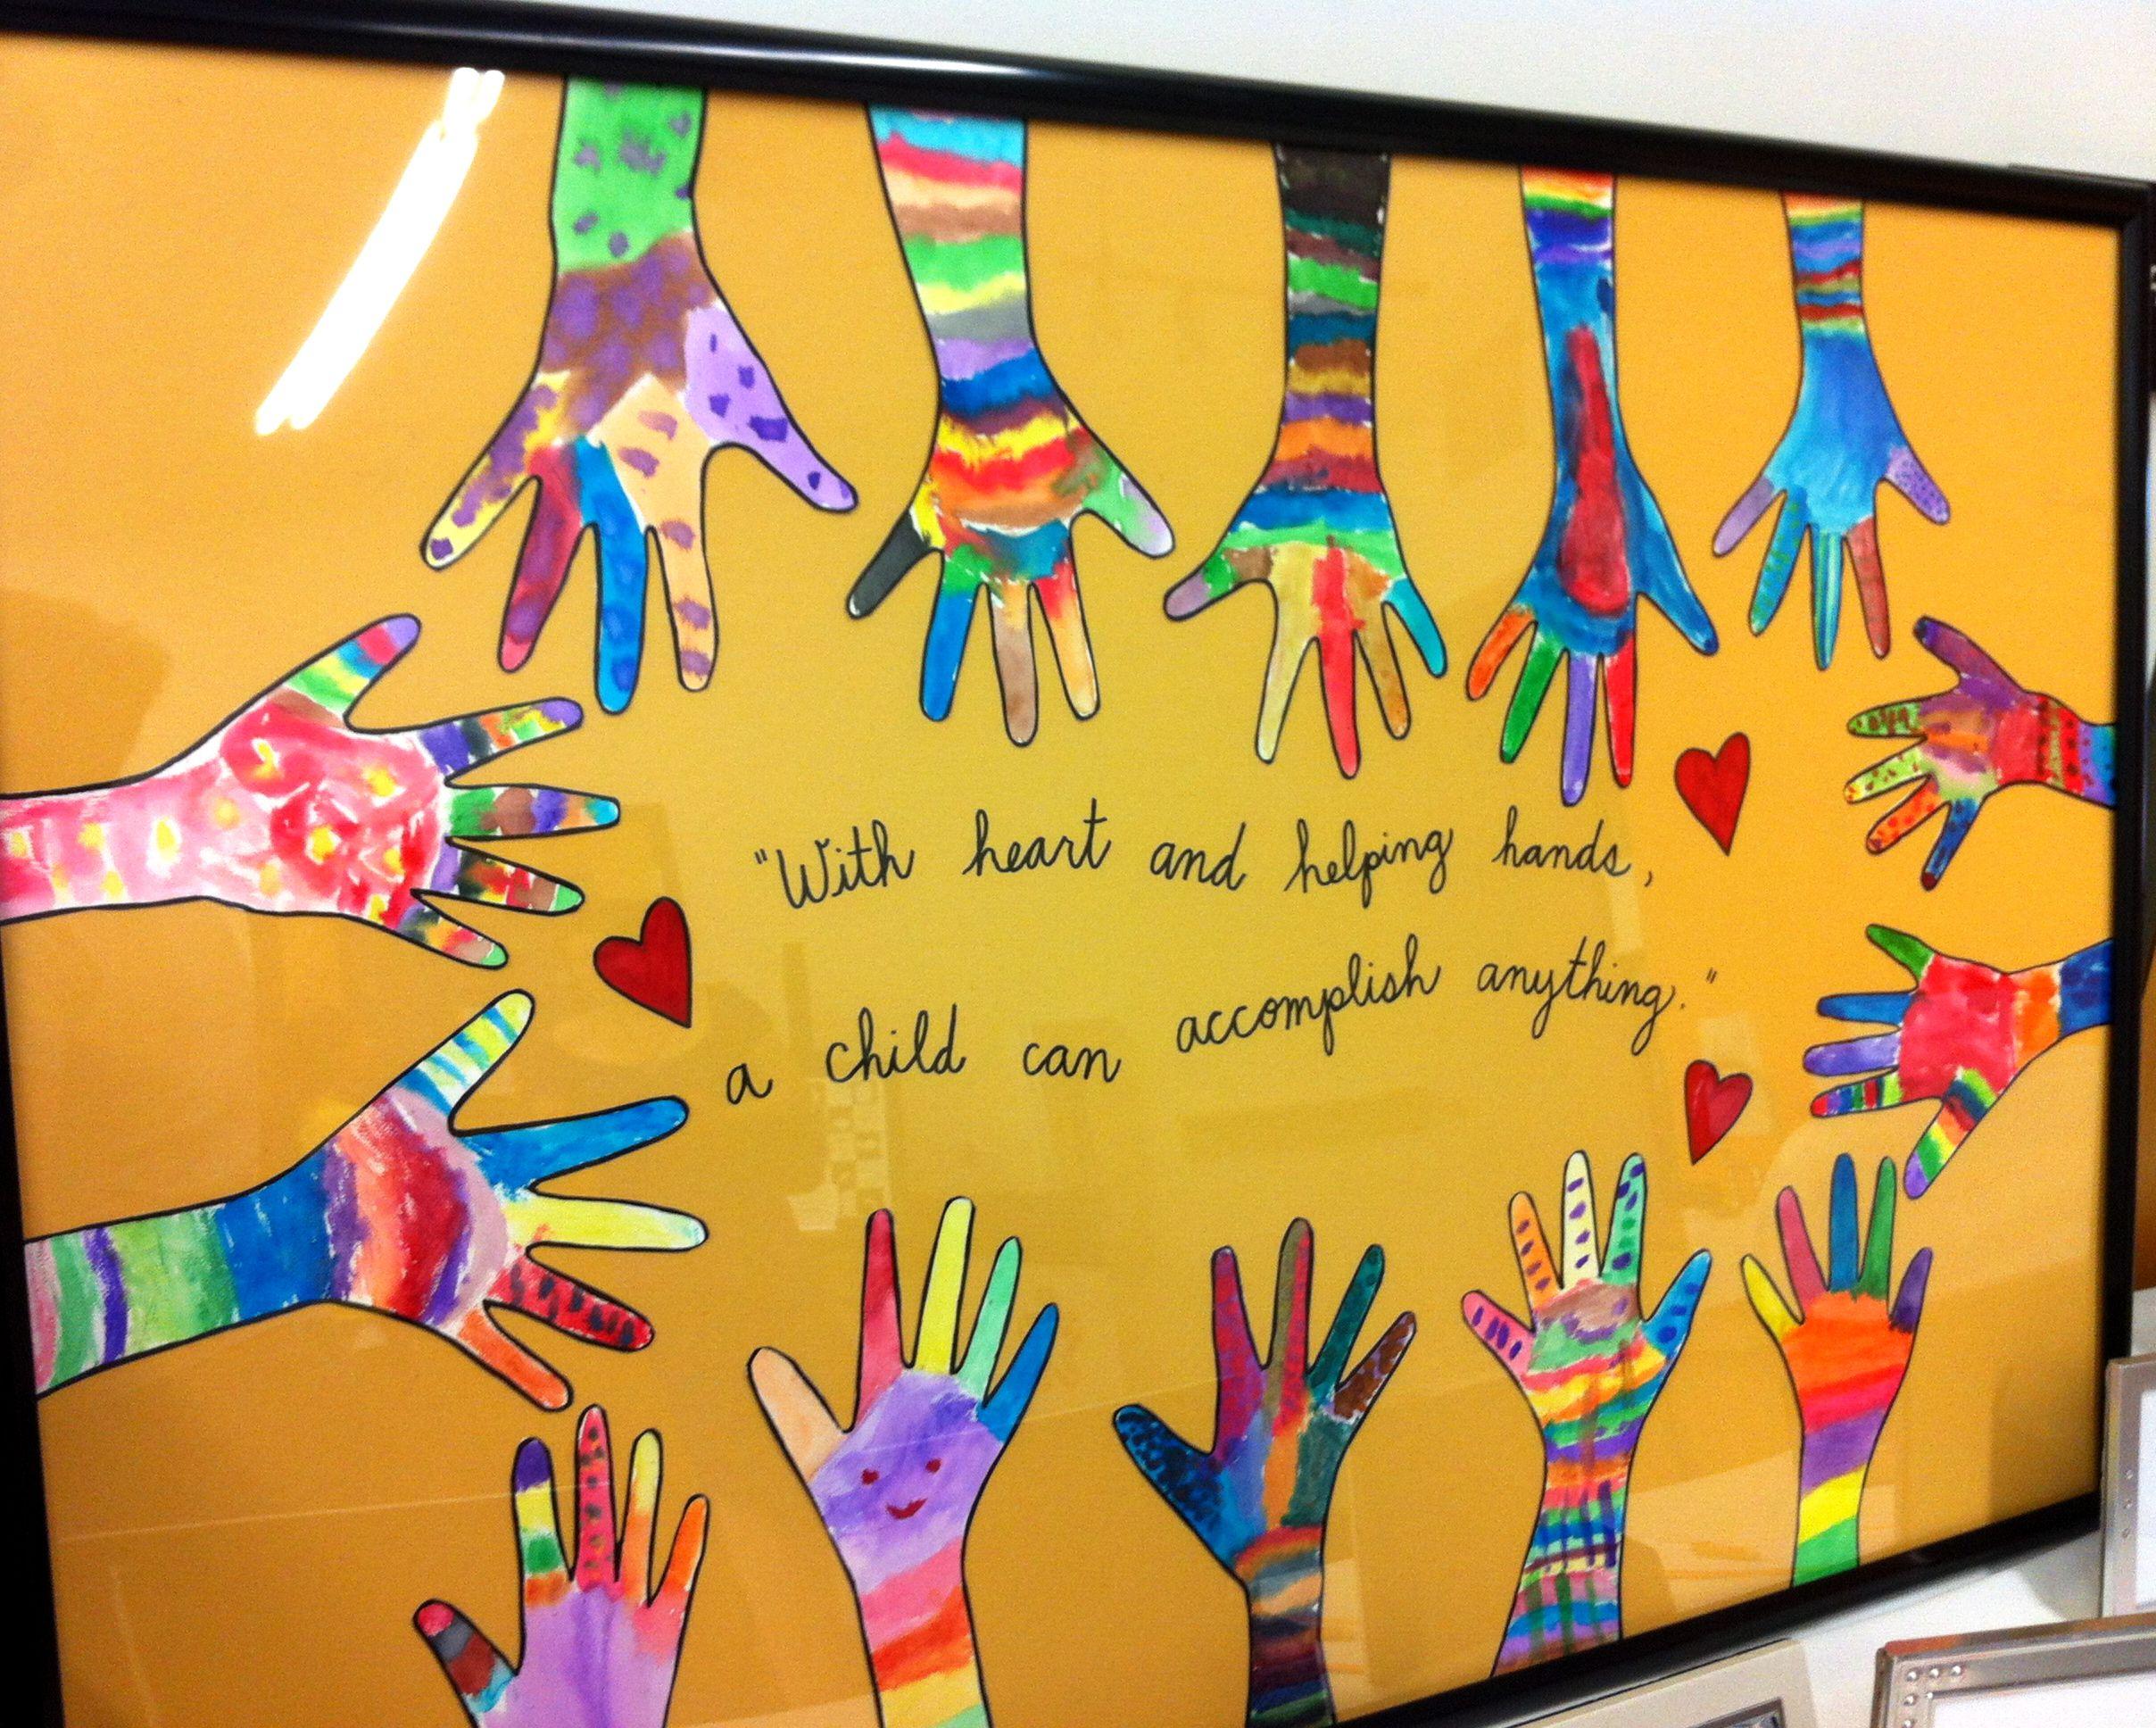 Helping Hands School Auction Item Teaching